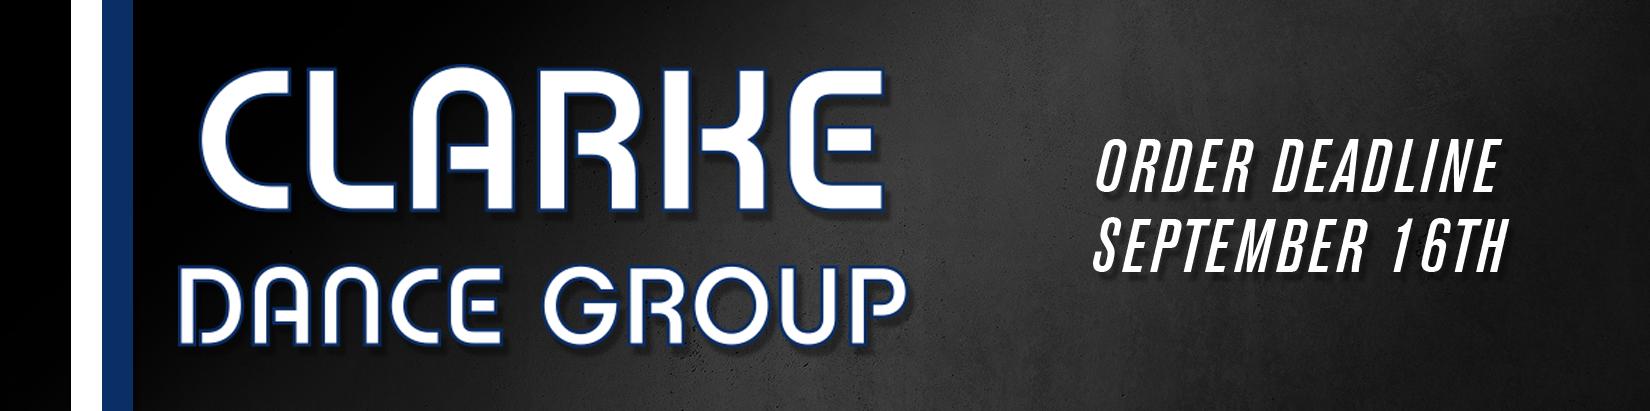 Clarke Dance Group